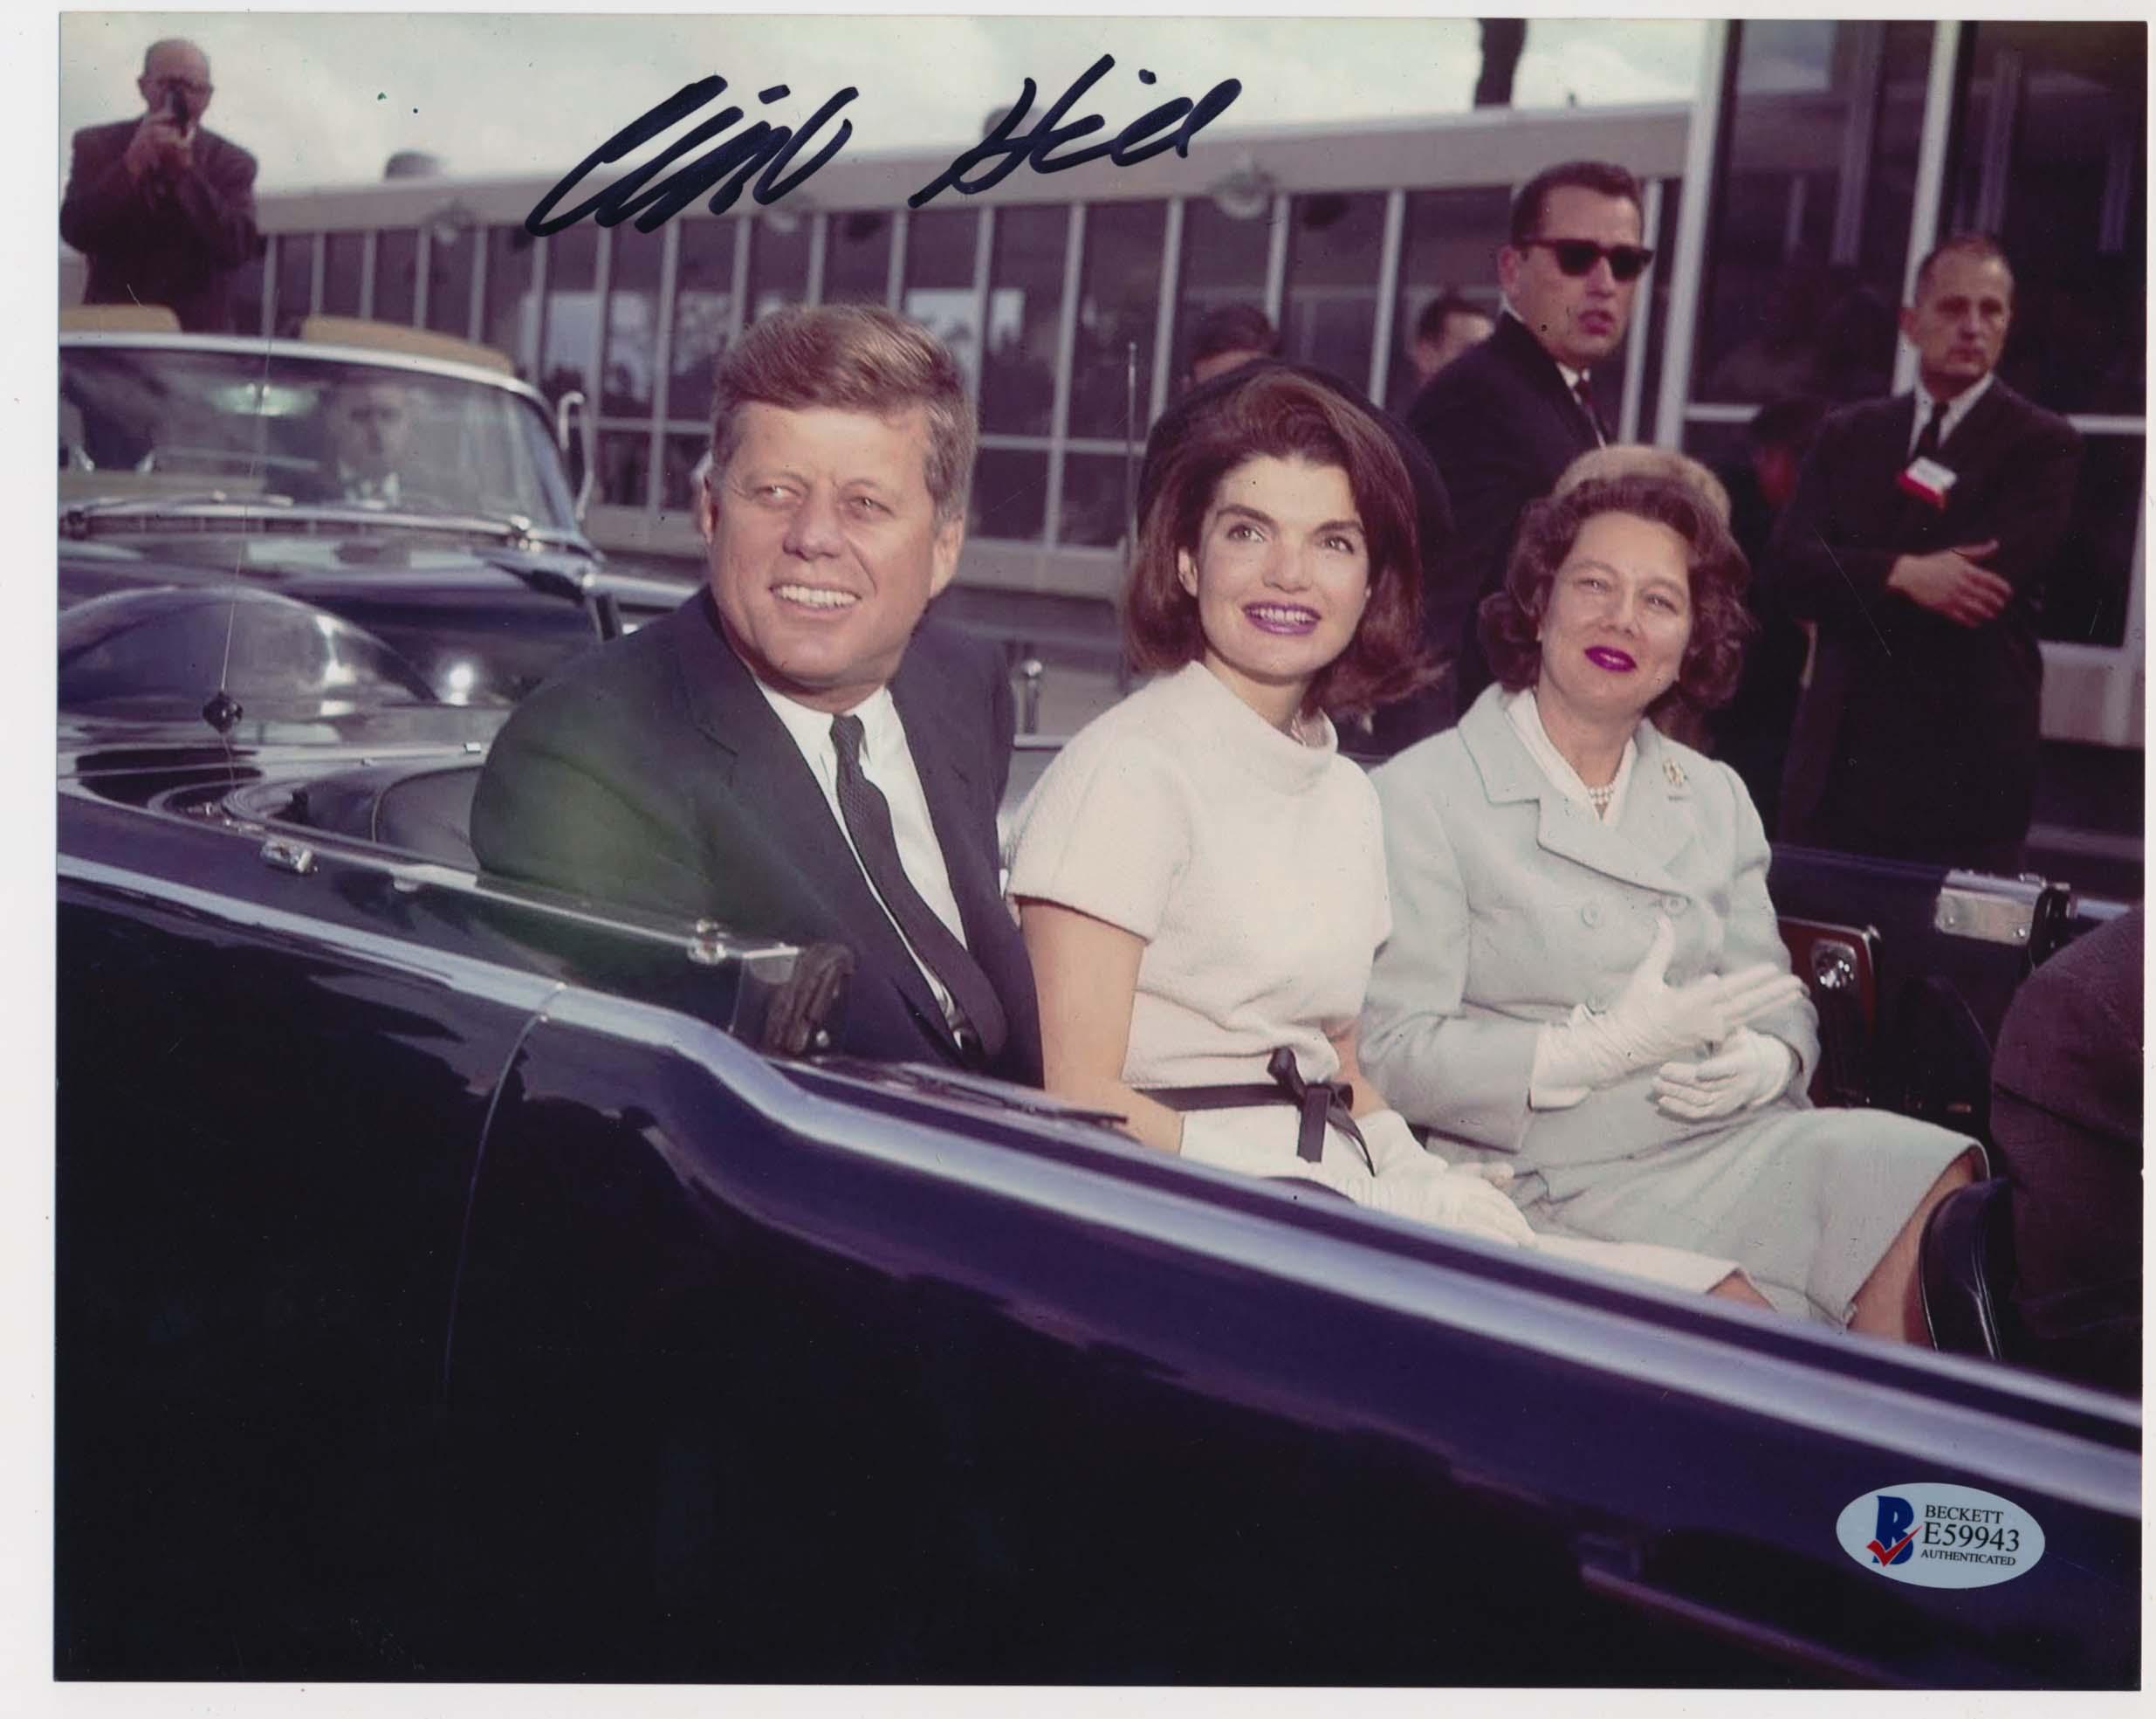 Lot #710     Hill, Clint Signed JFK and Jackie Kennedy Dallas Motorcade Photo  (JSA LOAA) Cond: 9.5